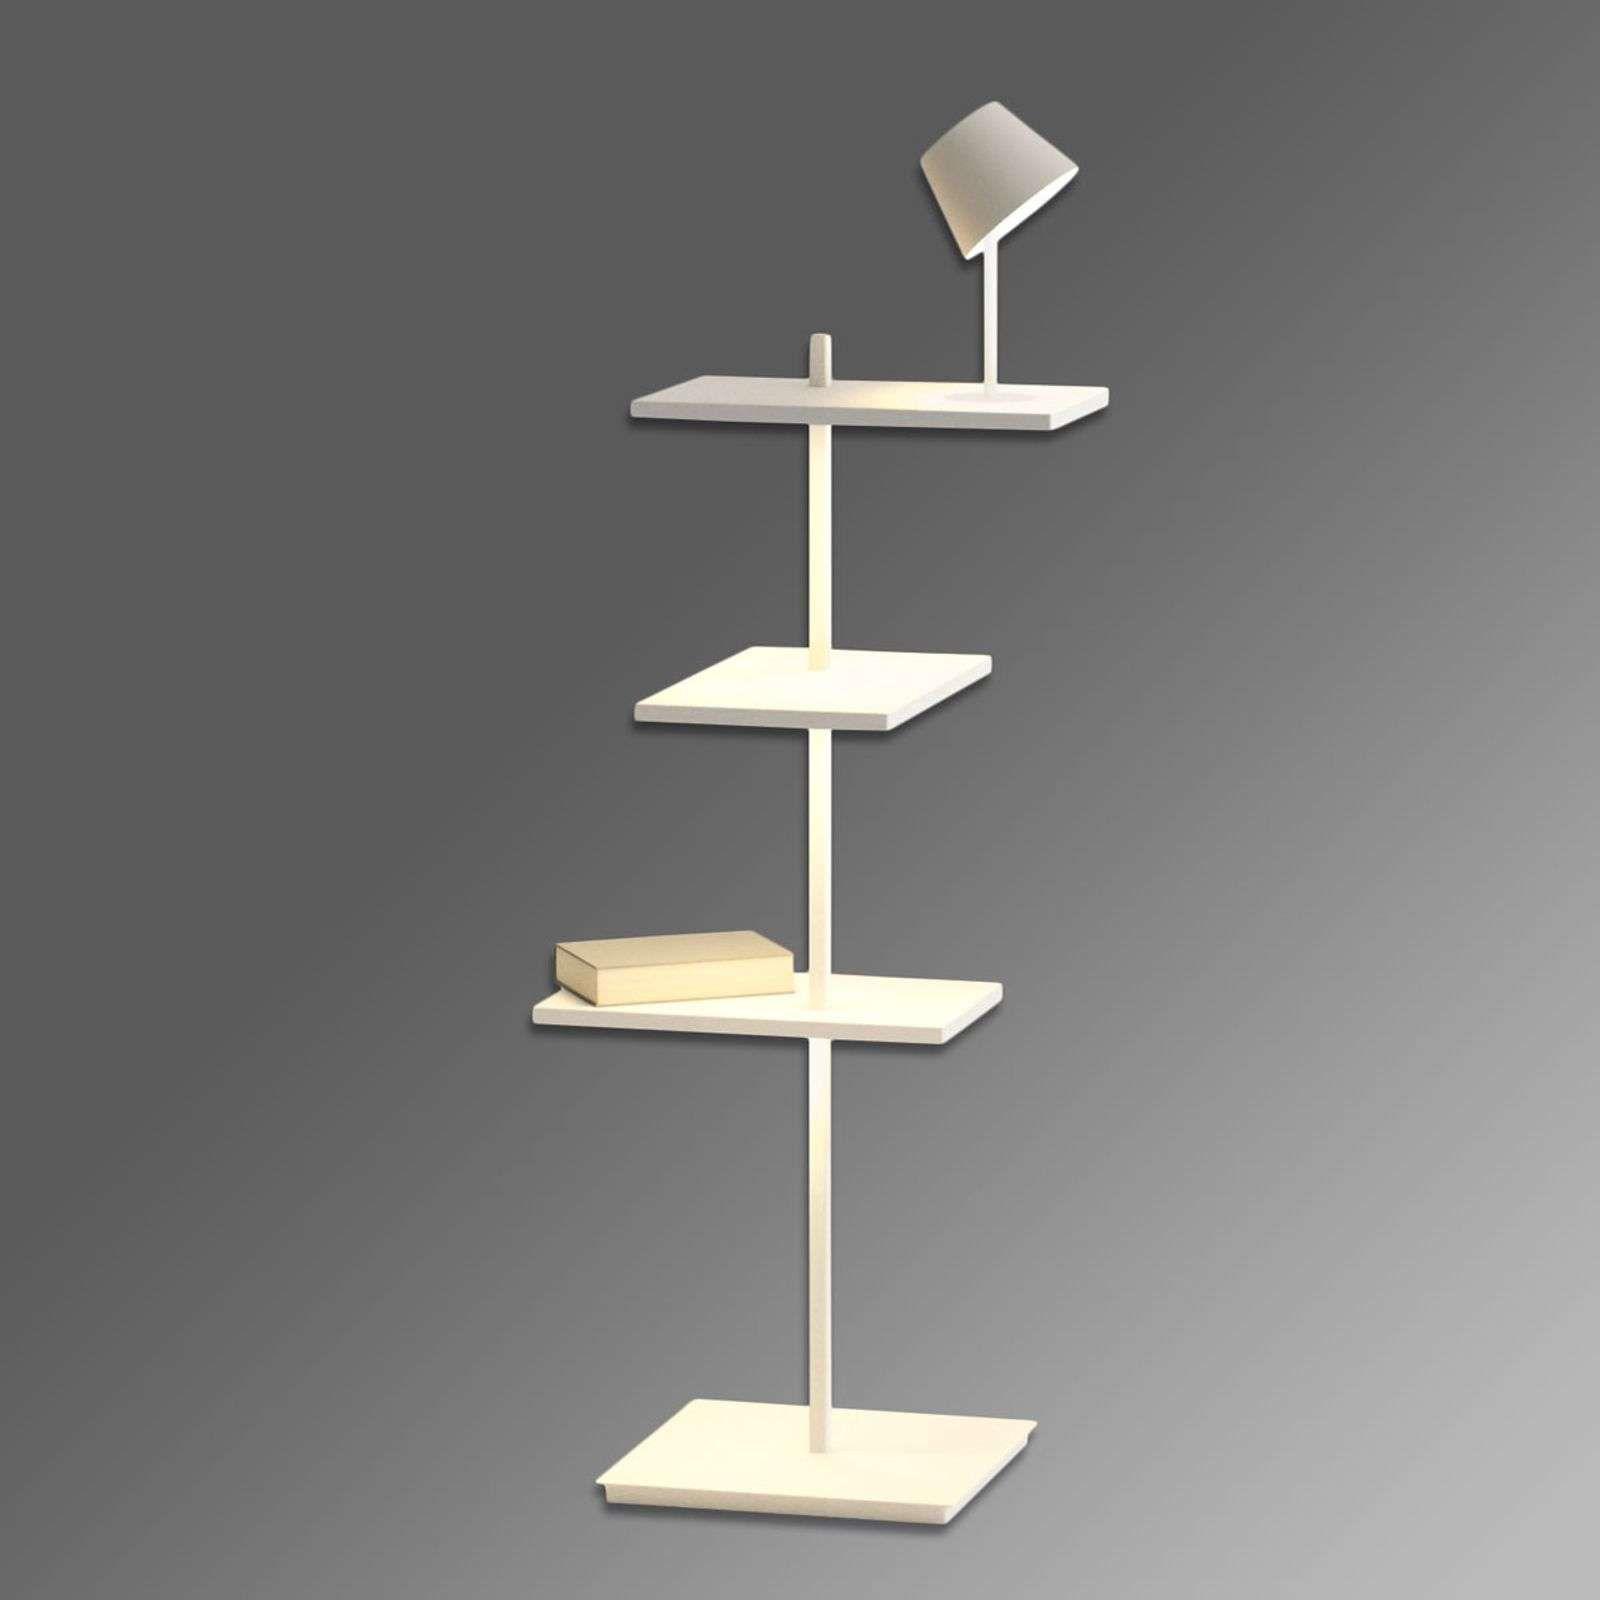 Multifunctionele led vloerlamp Suite 112 cm Lampen